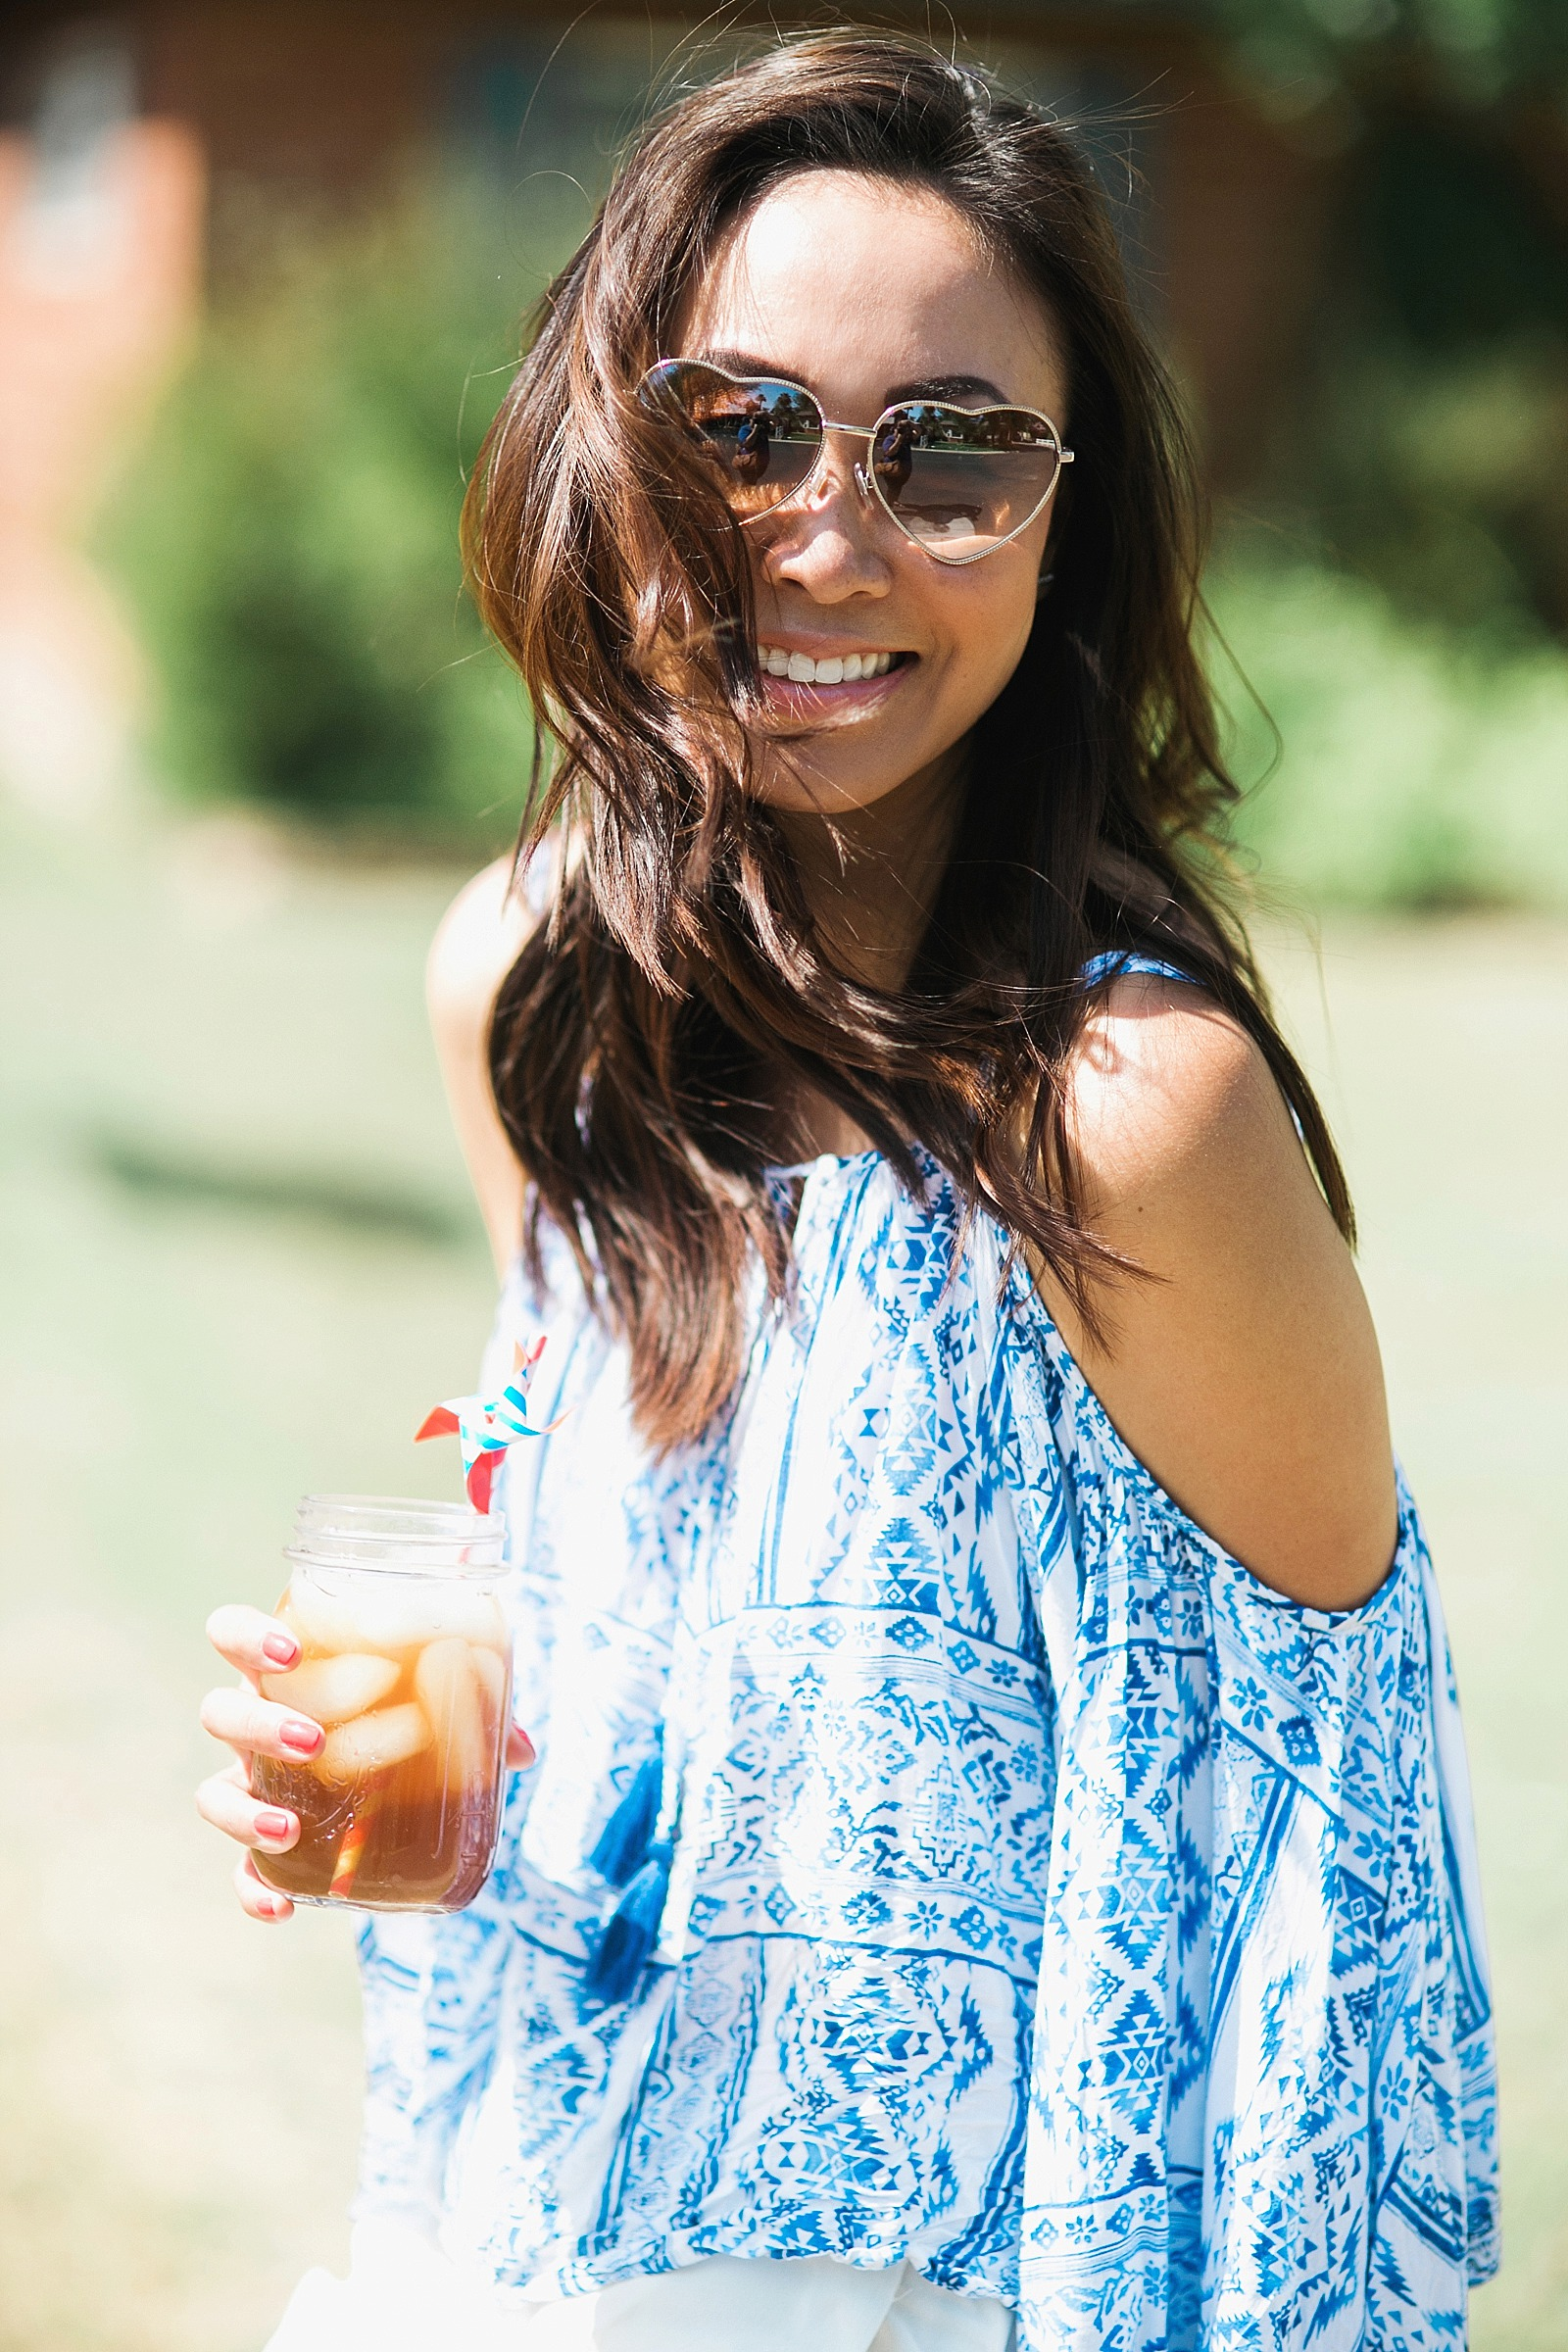 american-flag-fire-hydrant-painted-artistic-lifestyle-blogger-diana-elizabeth-blog-arizona-fashion-pool-summer-time_0100